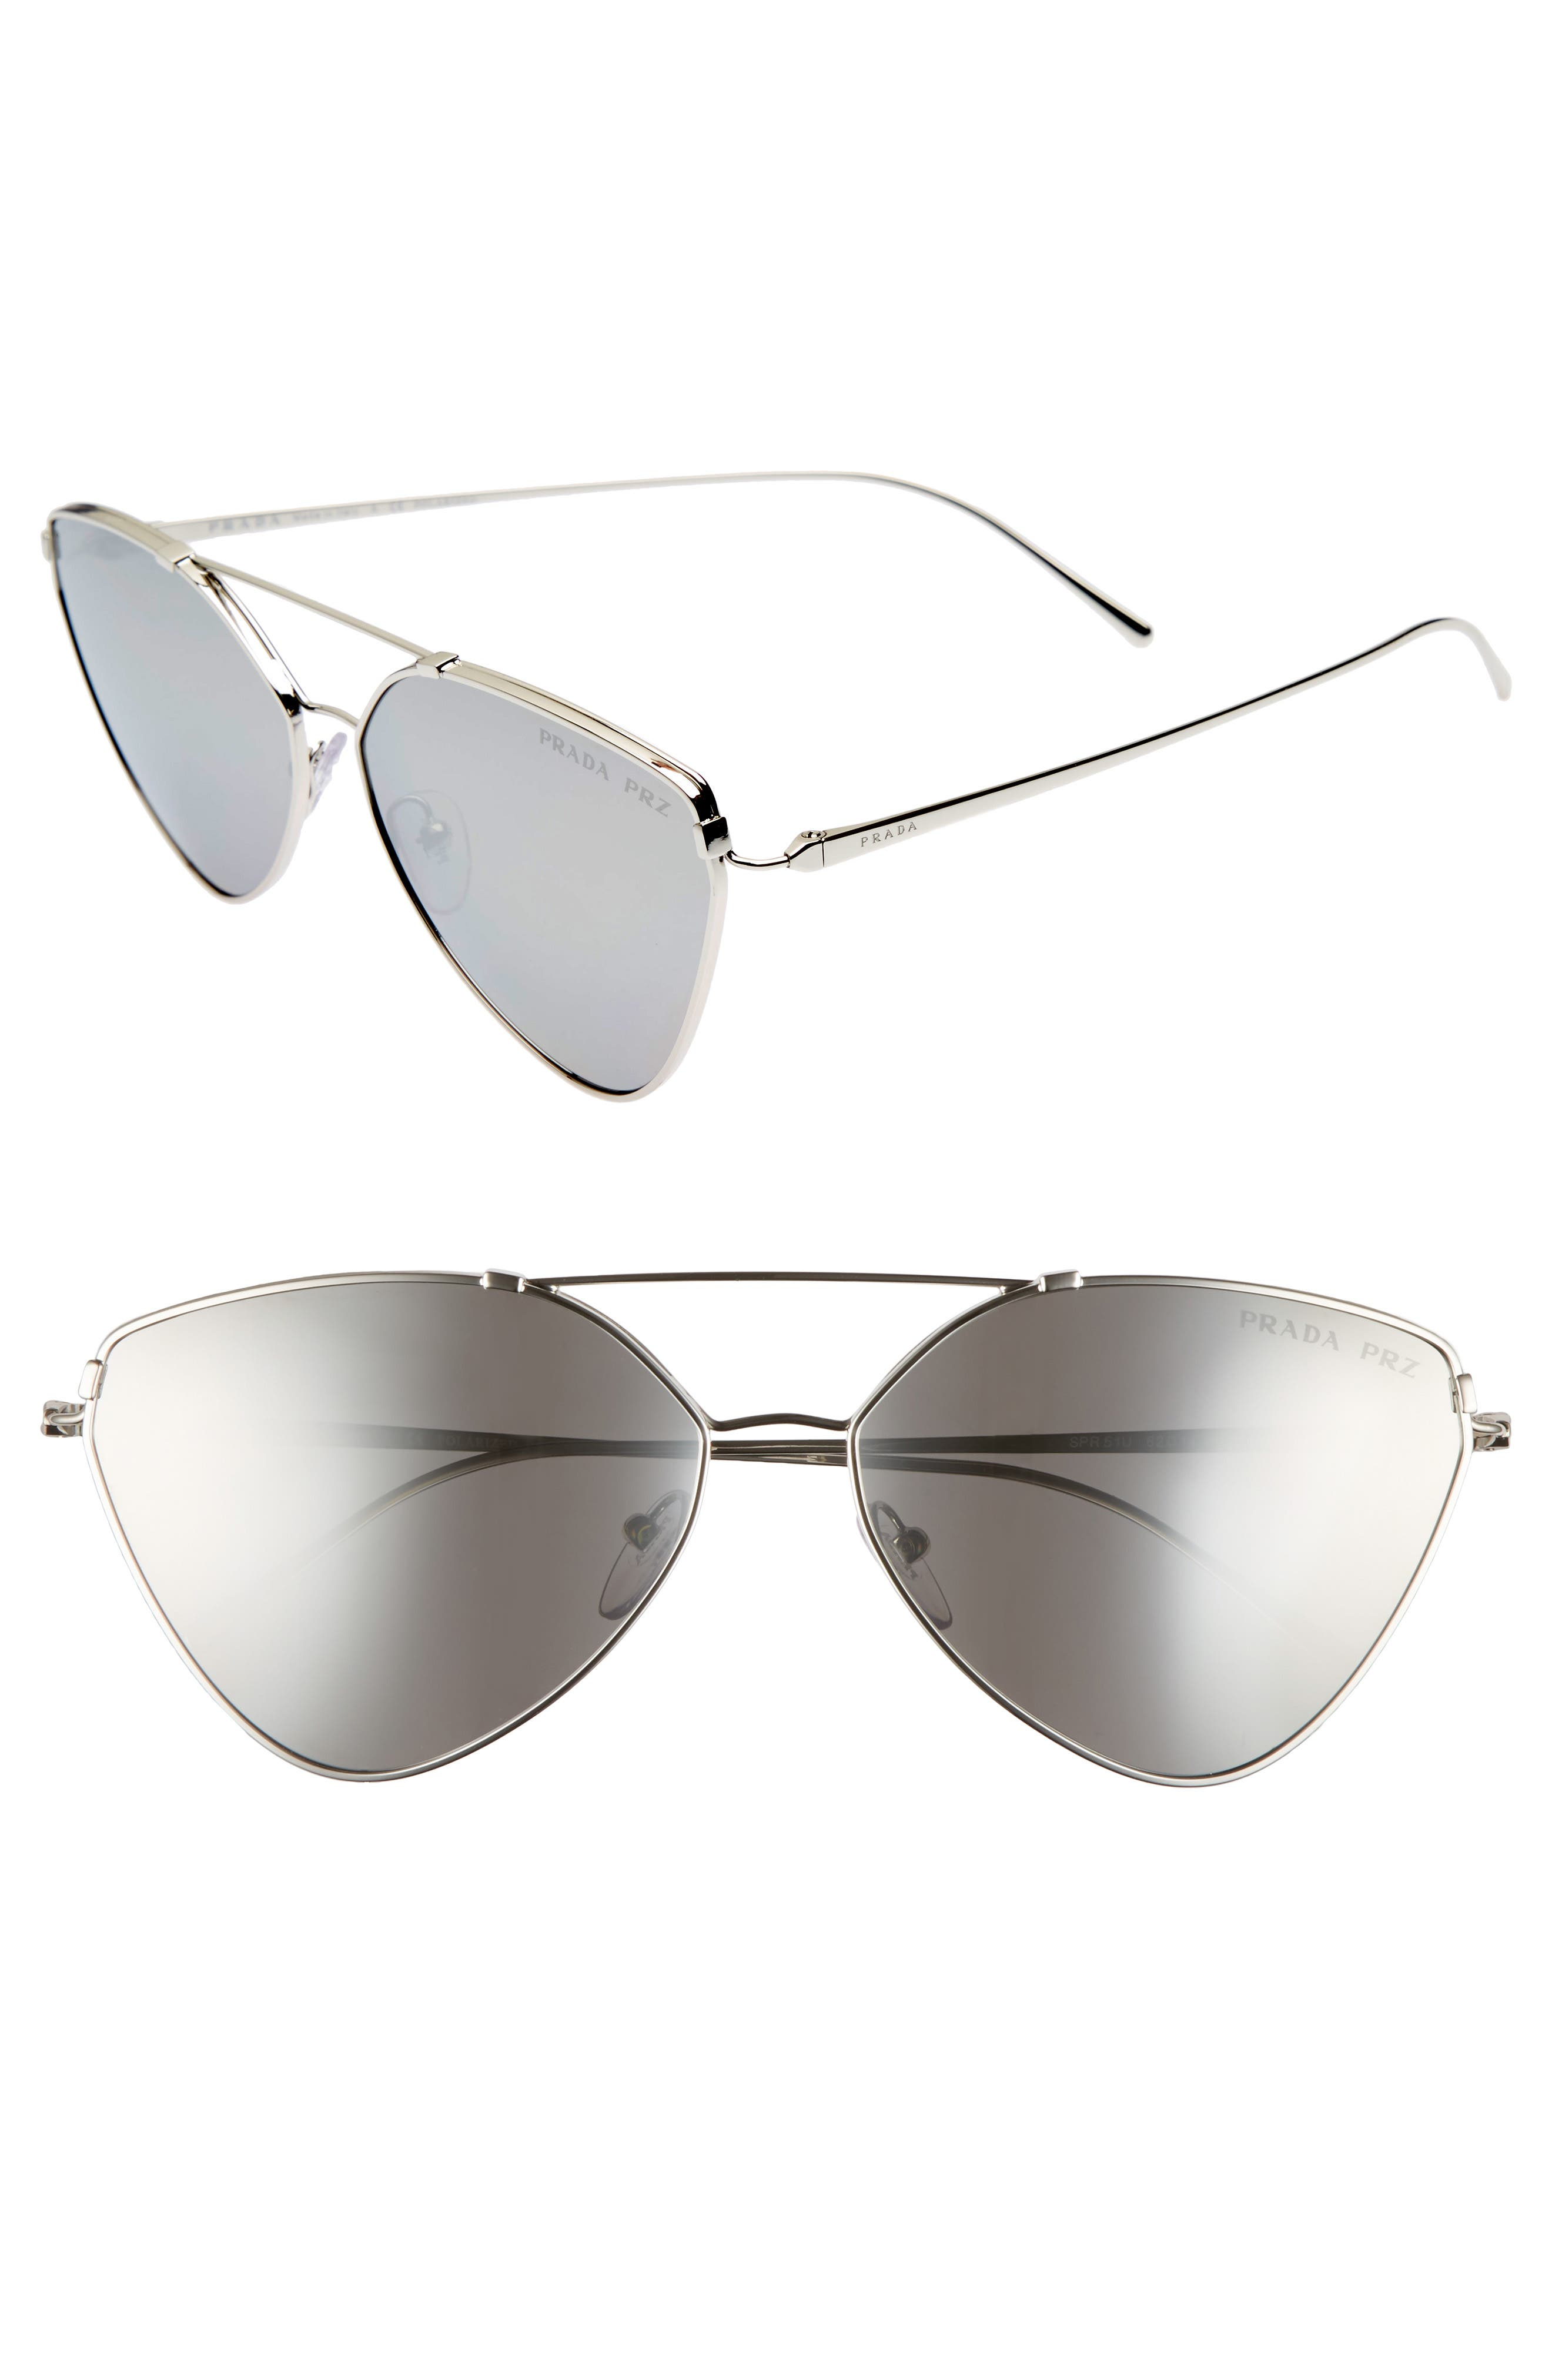 62mm Polarized Oversize Aviator Sunglasses,                             Main thumbnail 1, color,                             042